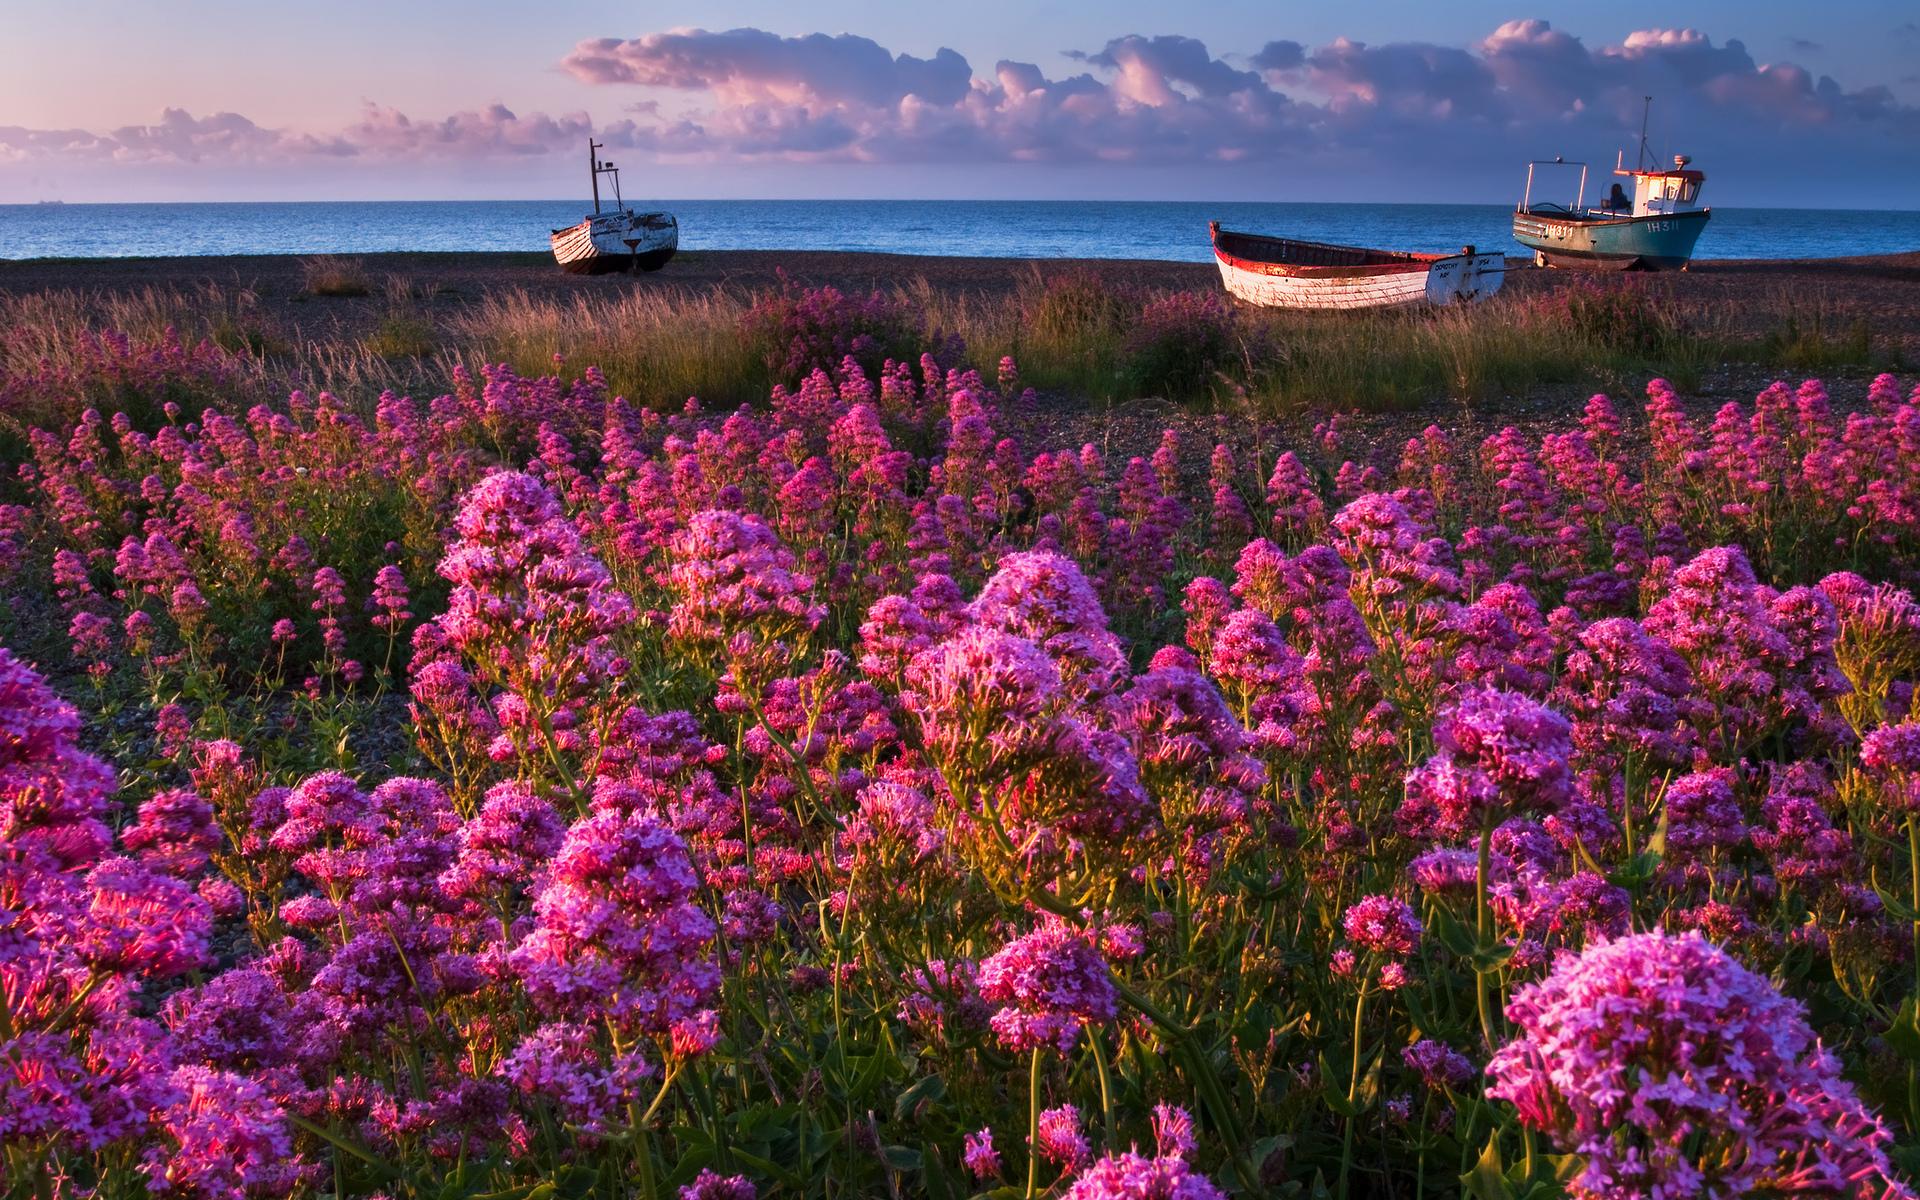 природа яркий фото лето кадре